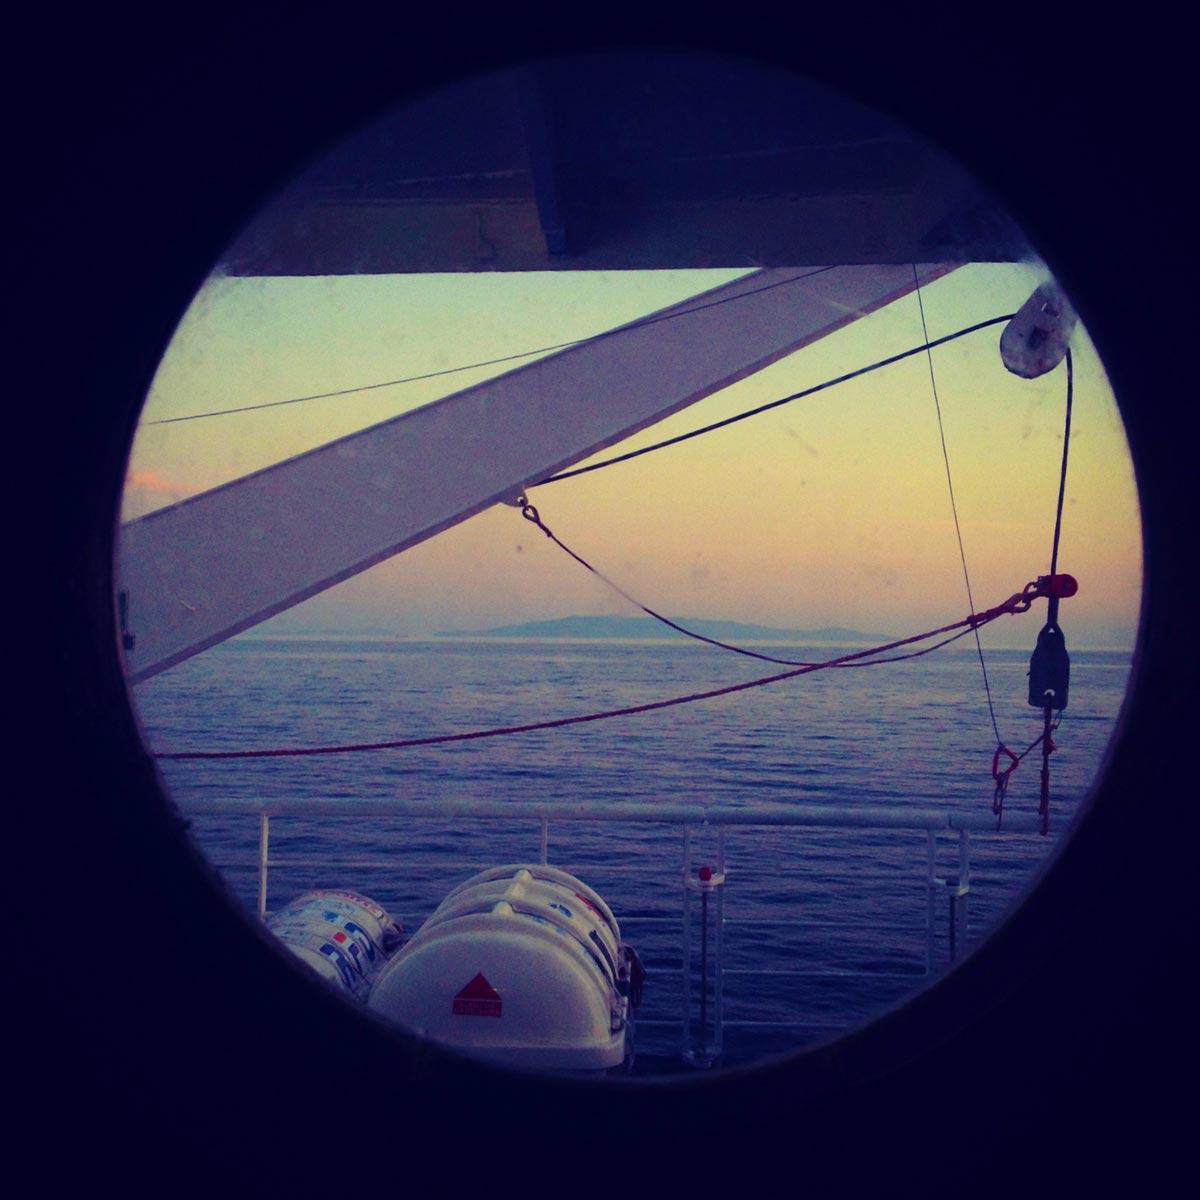 Cyclades sunset